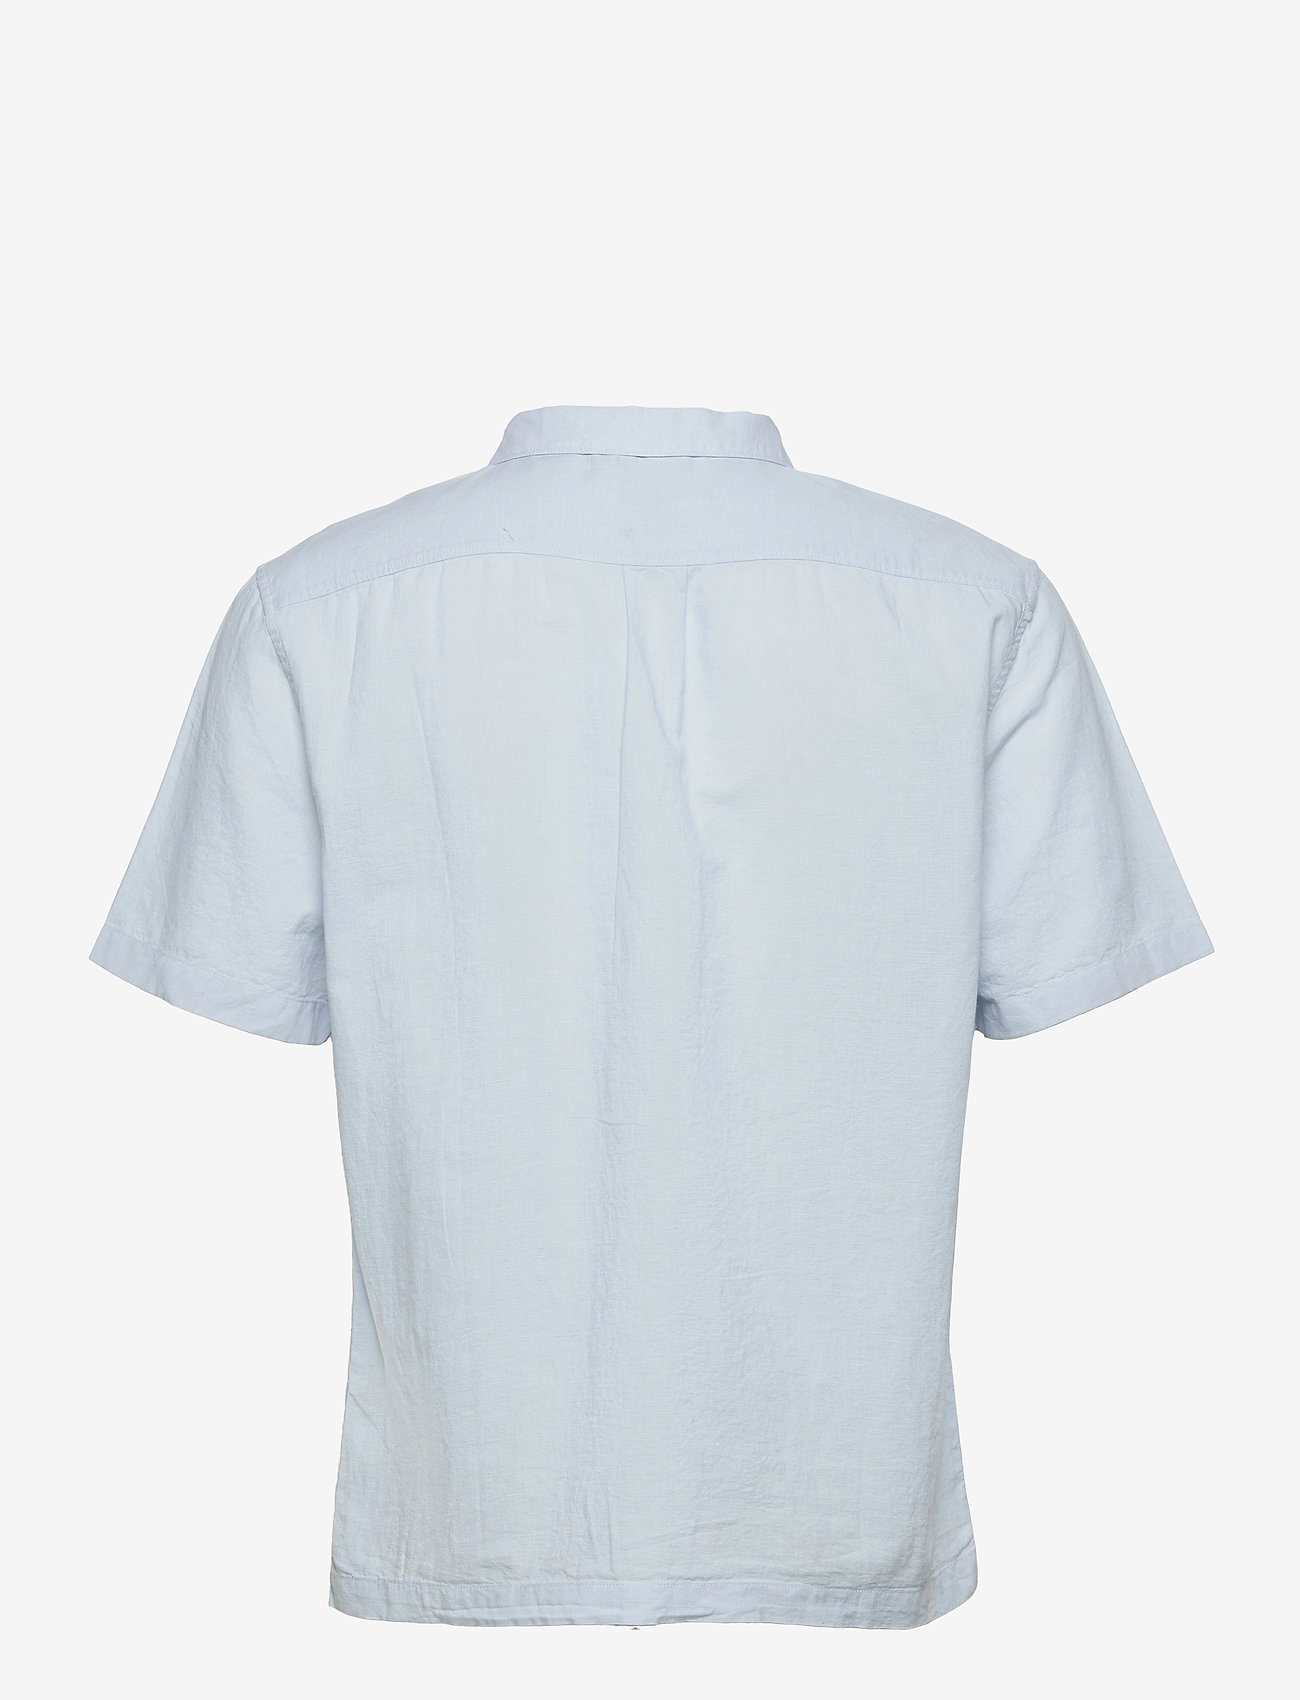 Lee Jeans - SS RESORT SHIRT - basic shirts - skyway blue - 1